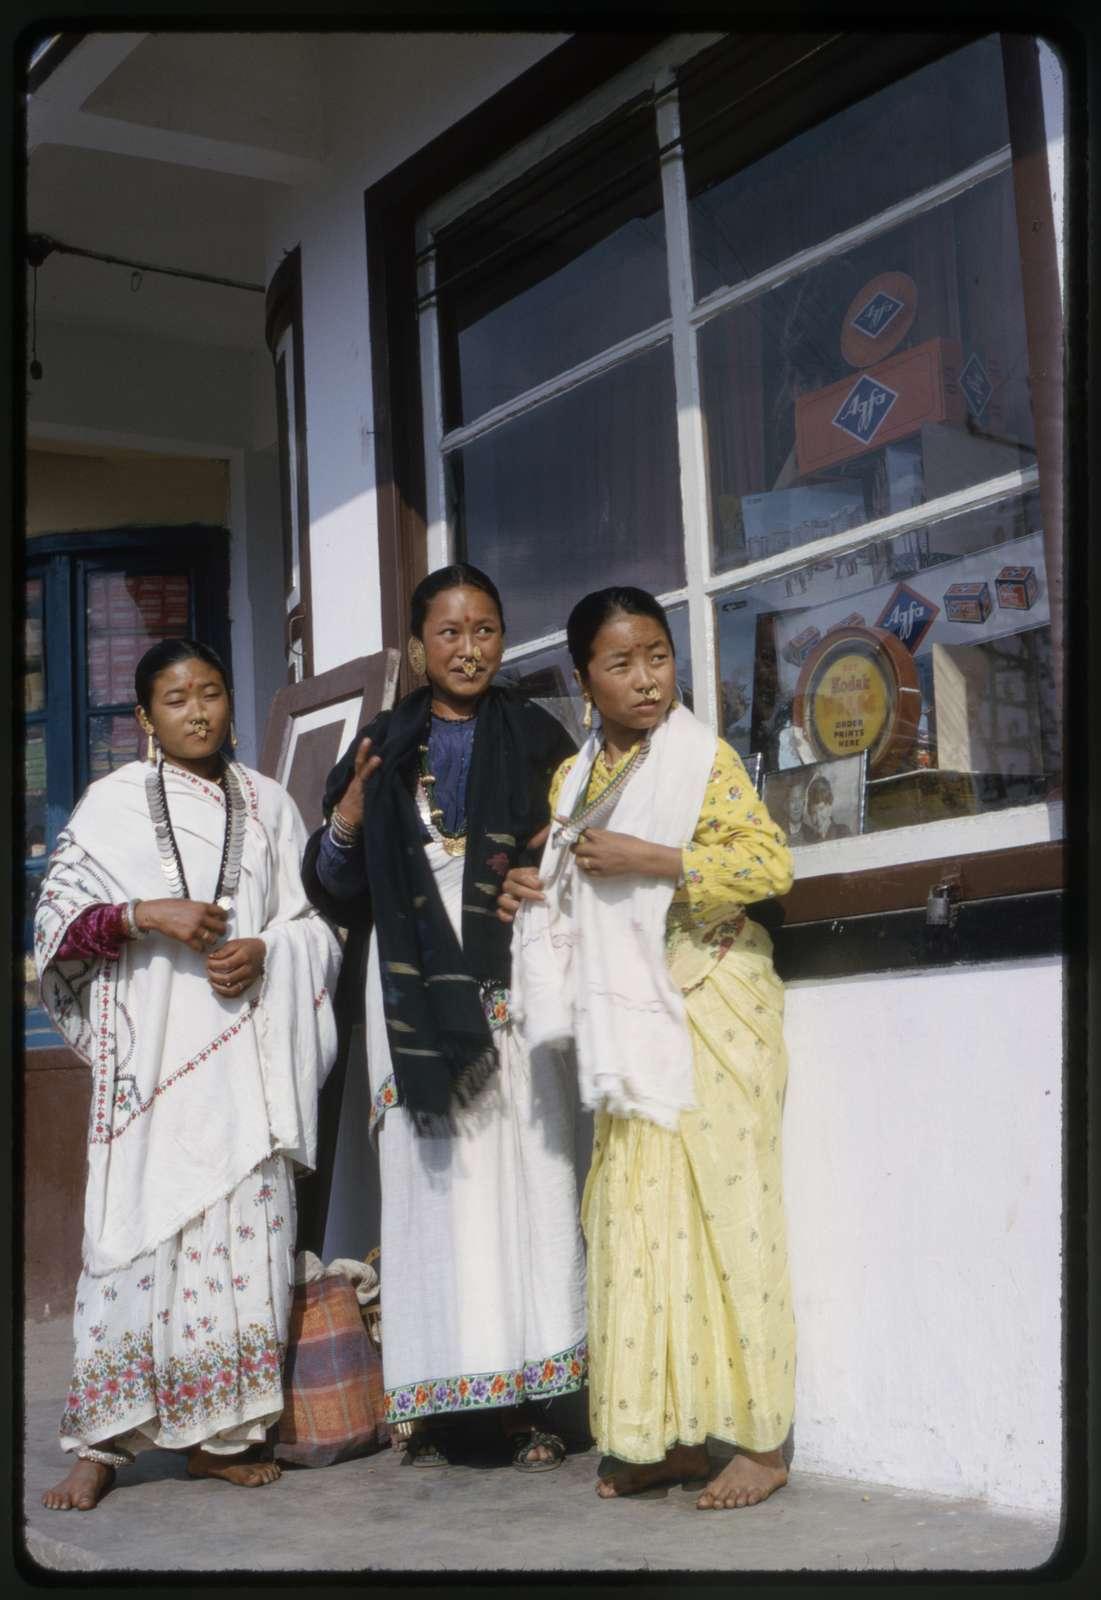 Nepali girls, coronation time. Tse Ten Tashi studio, photo in window, Hope's husb[and]